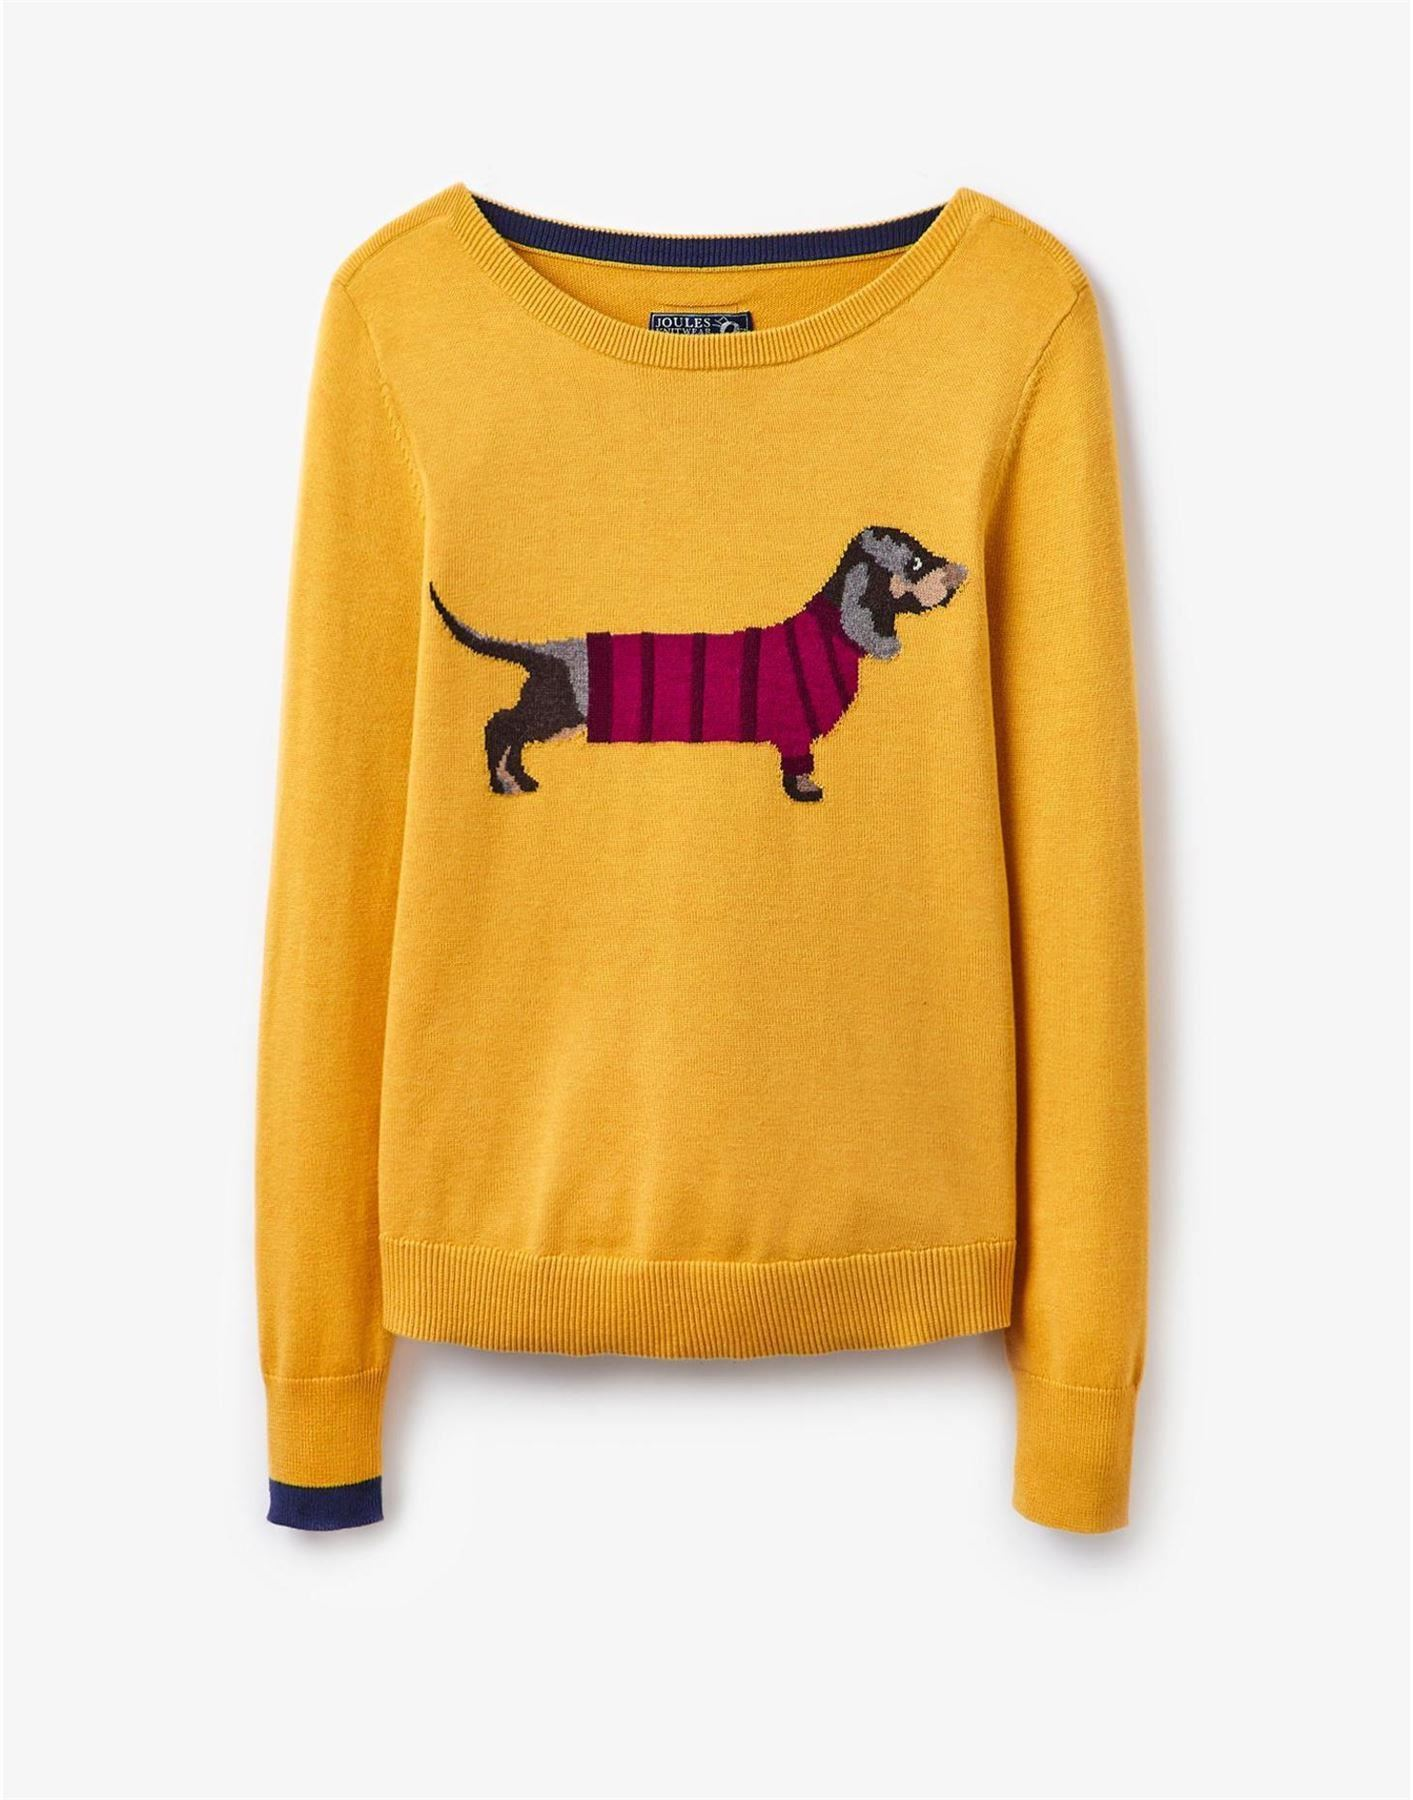 Ebay Christmas Sweaters